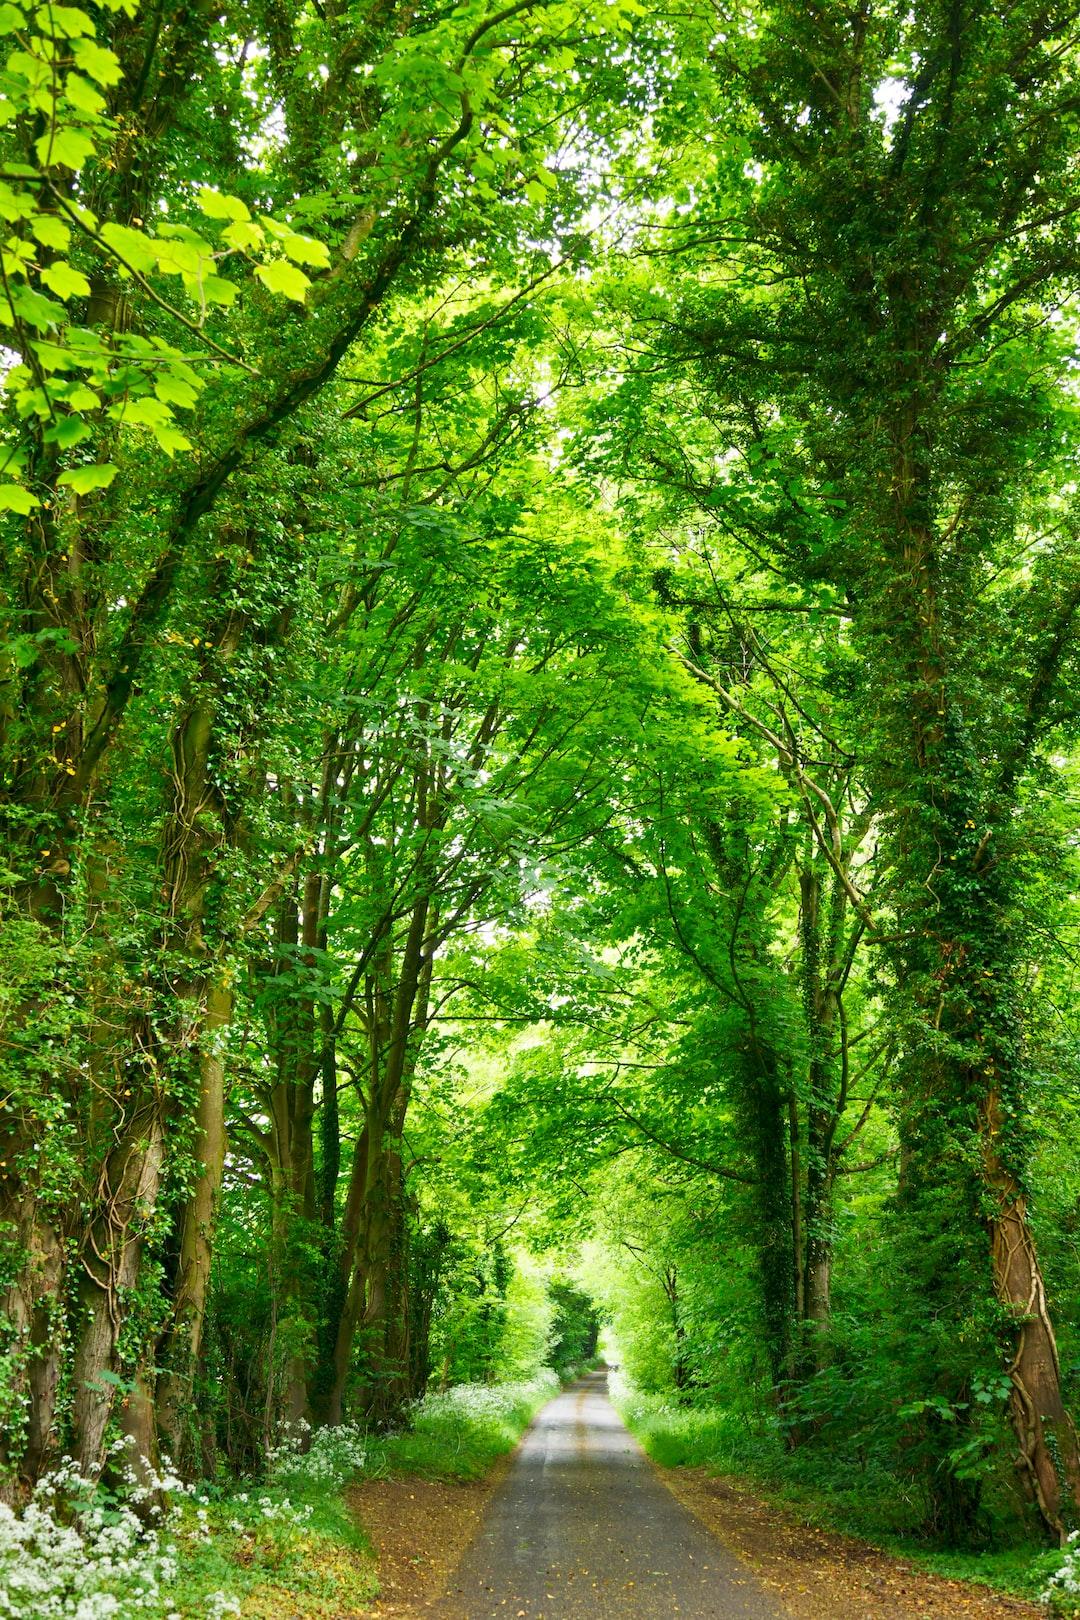 gray concrete road top between green trees photo u2013 Free u003cbu003eNatureu003c/bu003e ...